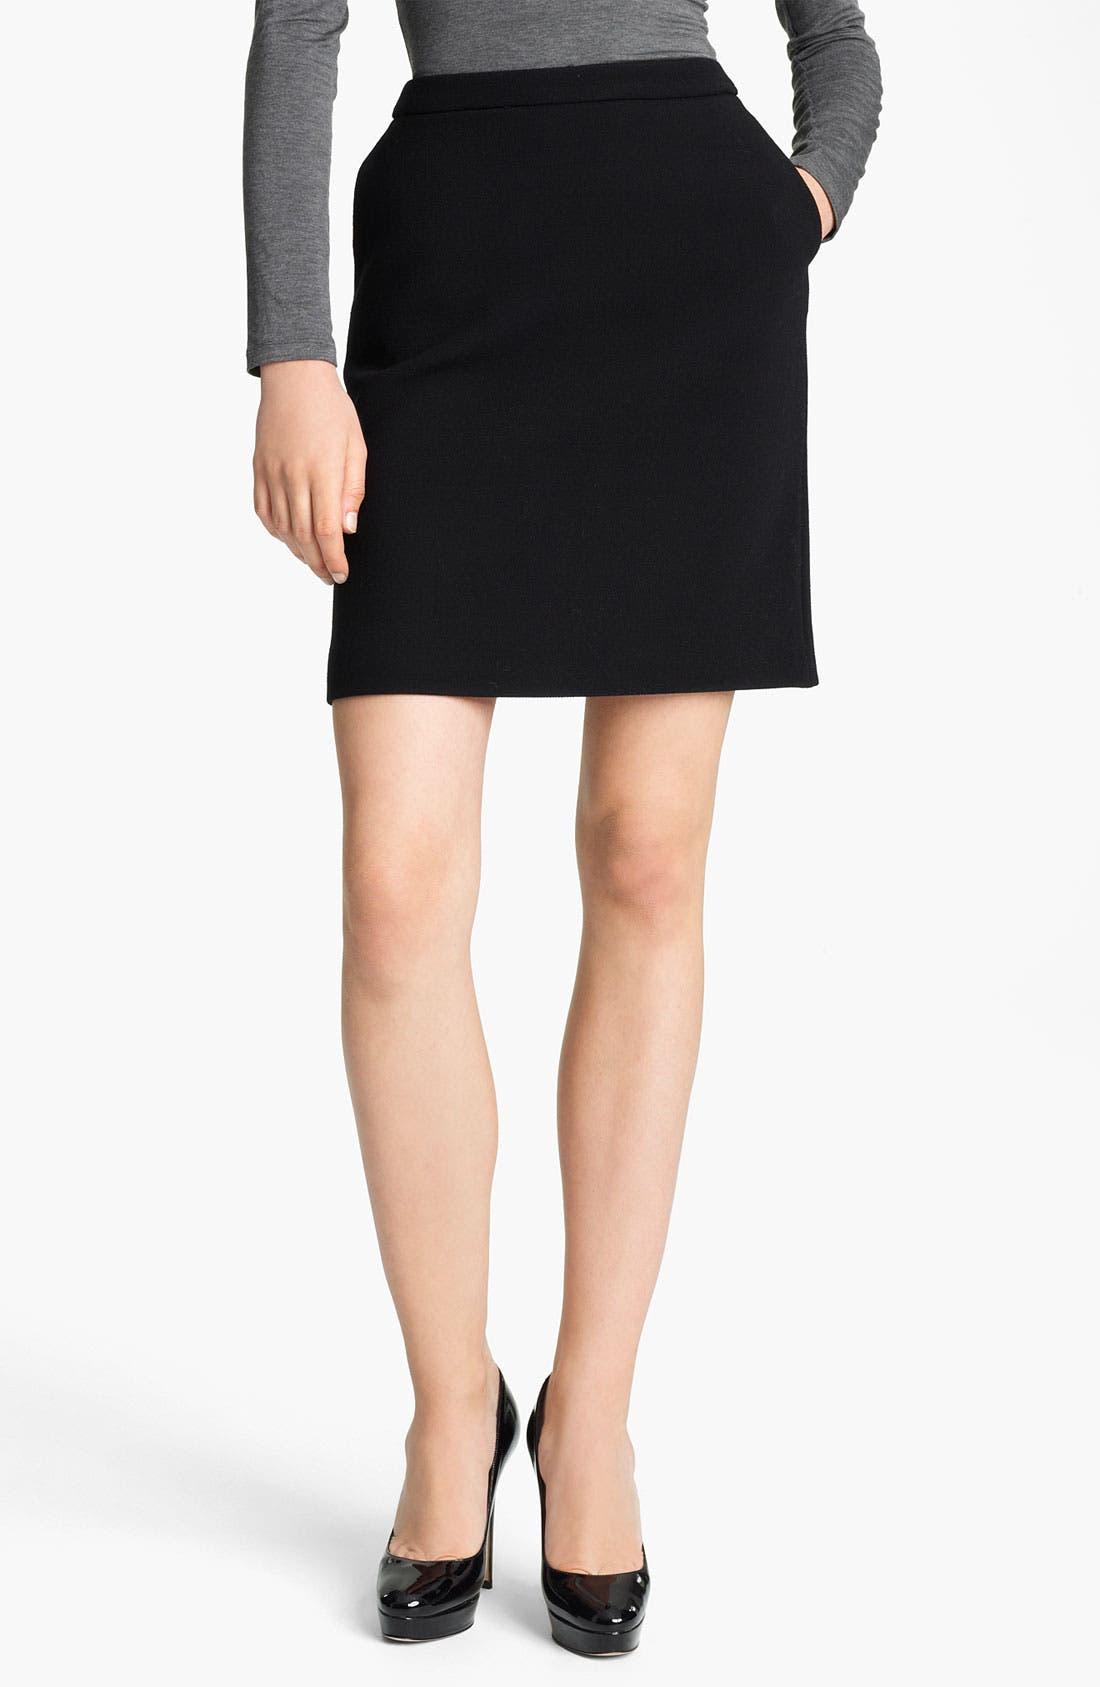 Alternate Image 1 Selected - Max Mara 'Sagoma' Wool Skirt